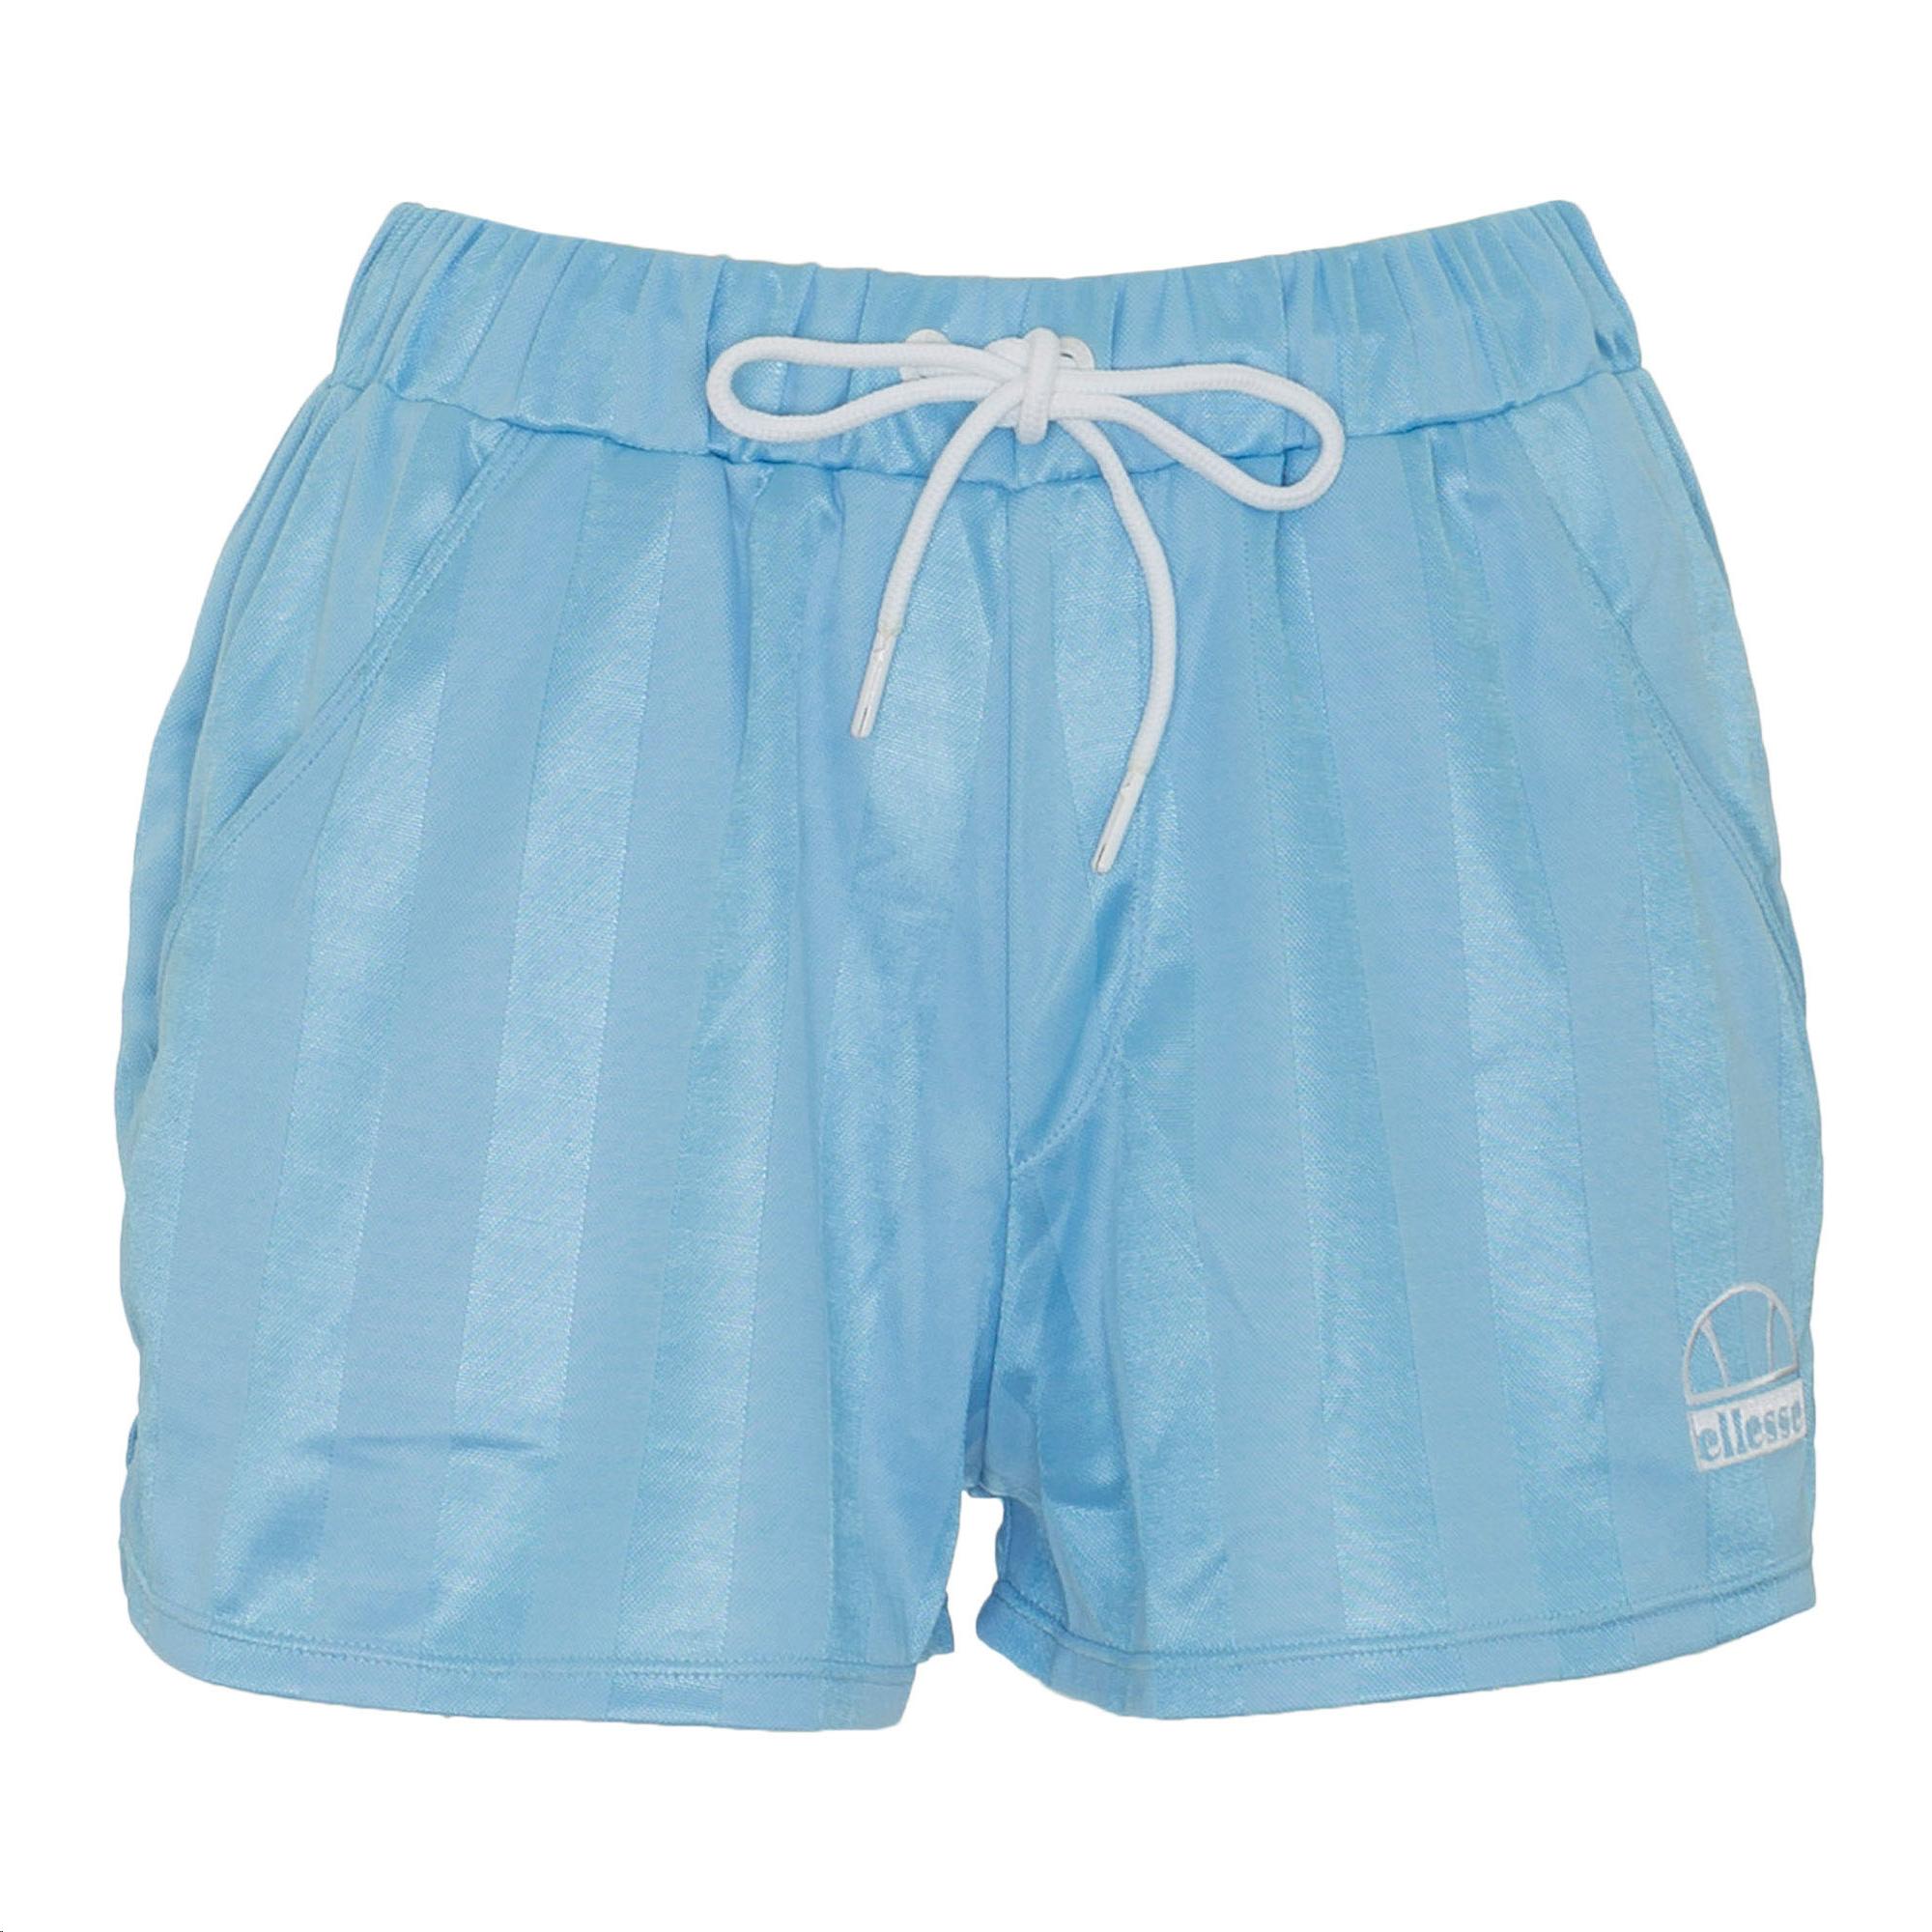 19f5b0a4844a Pantalón corto Ellesse Anda azul claro mujer - Deportes Moya